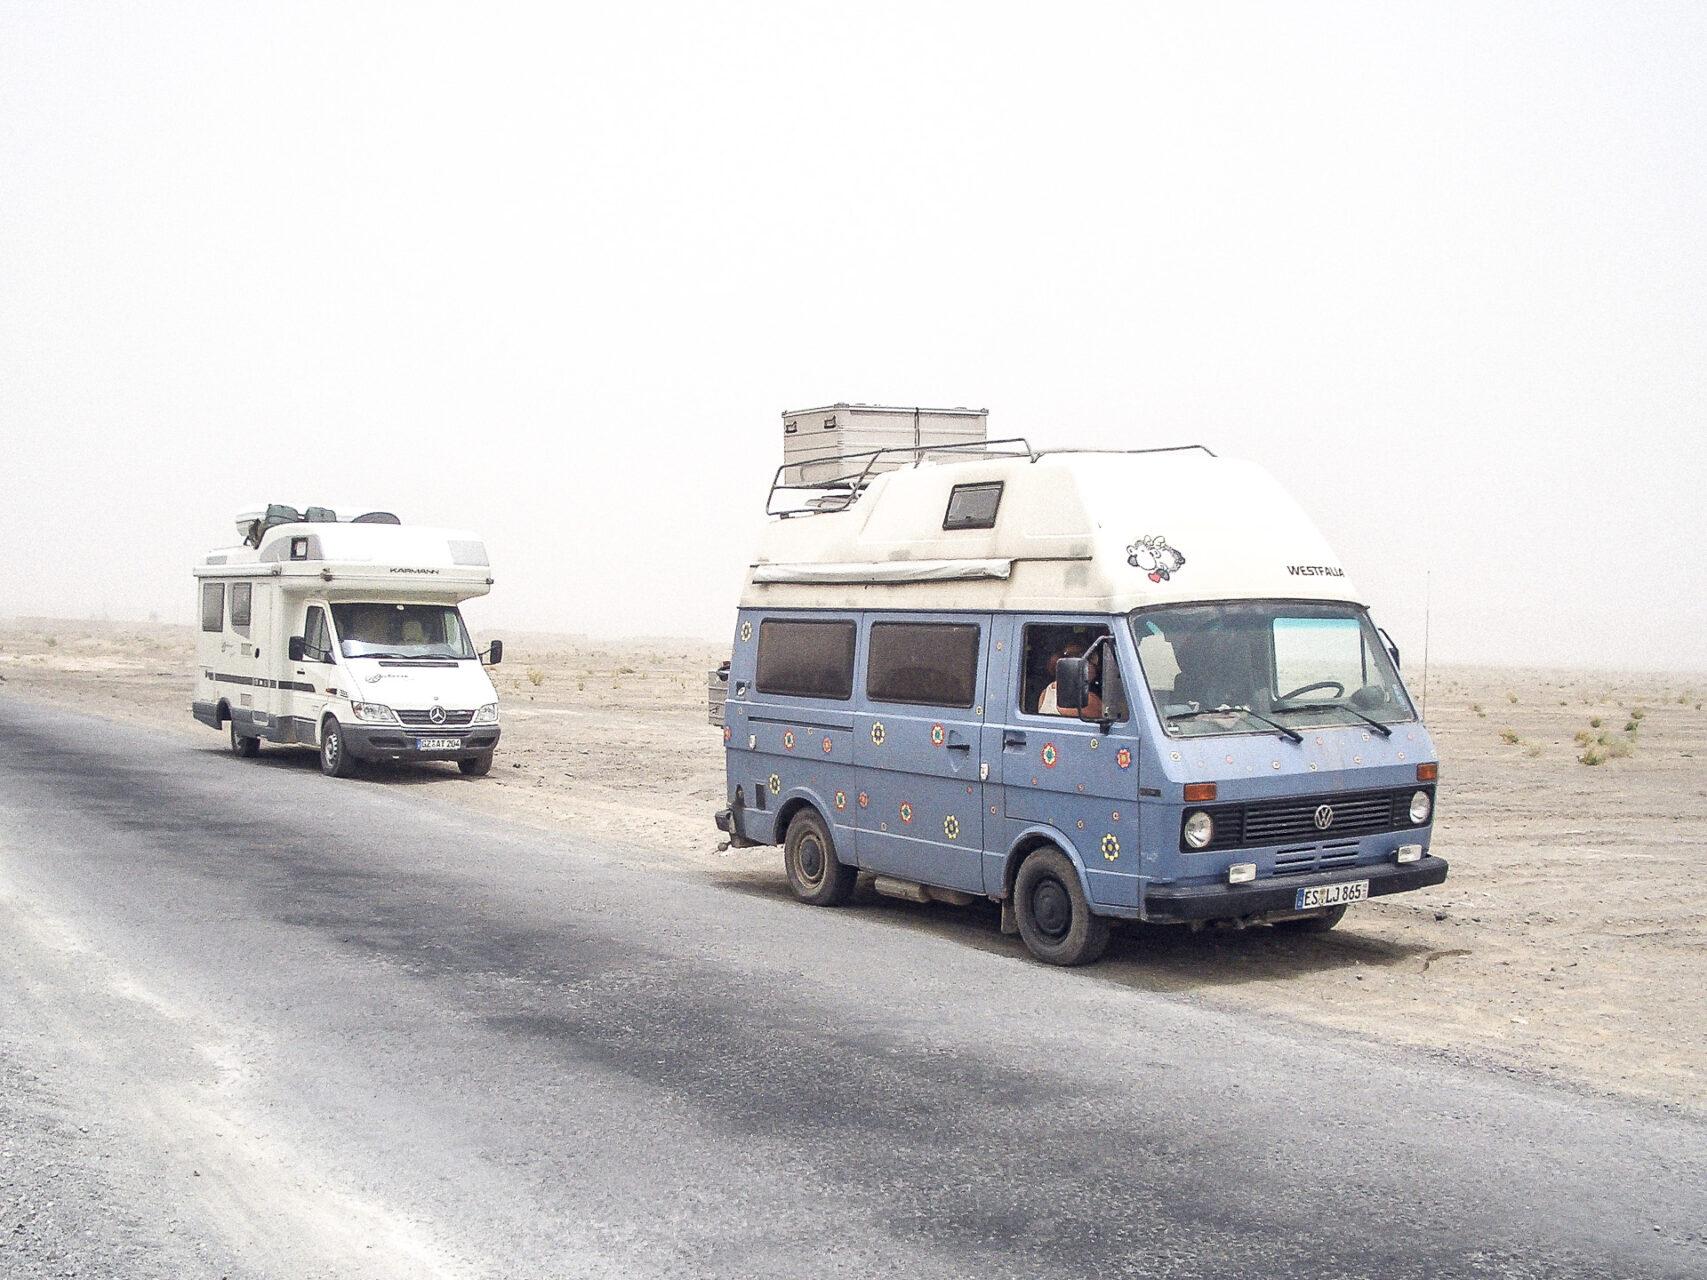 Wohnmobil in Pakistan